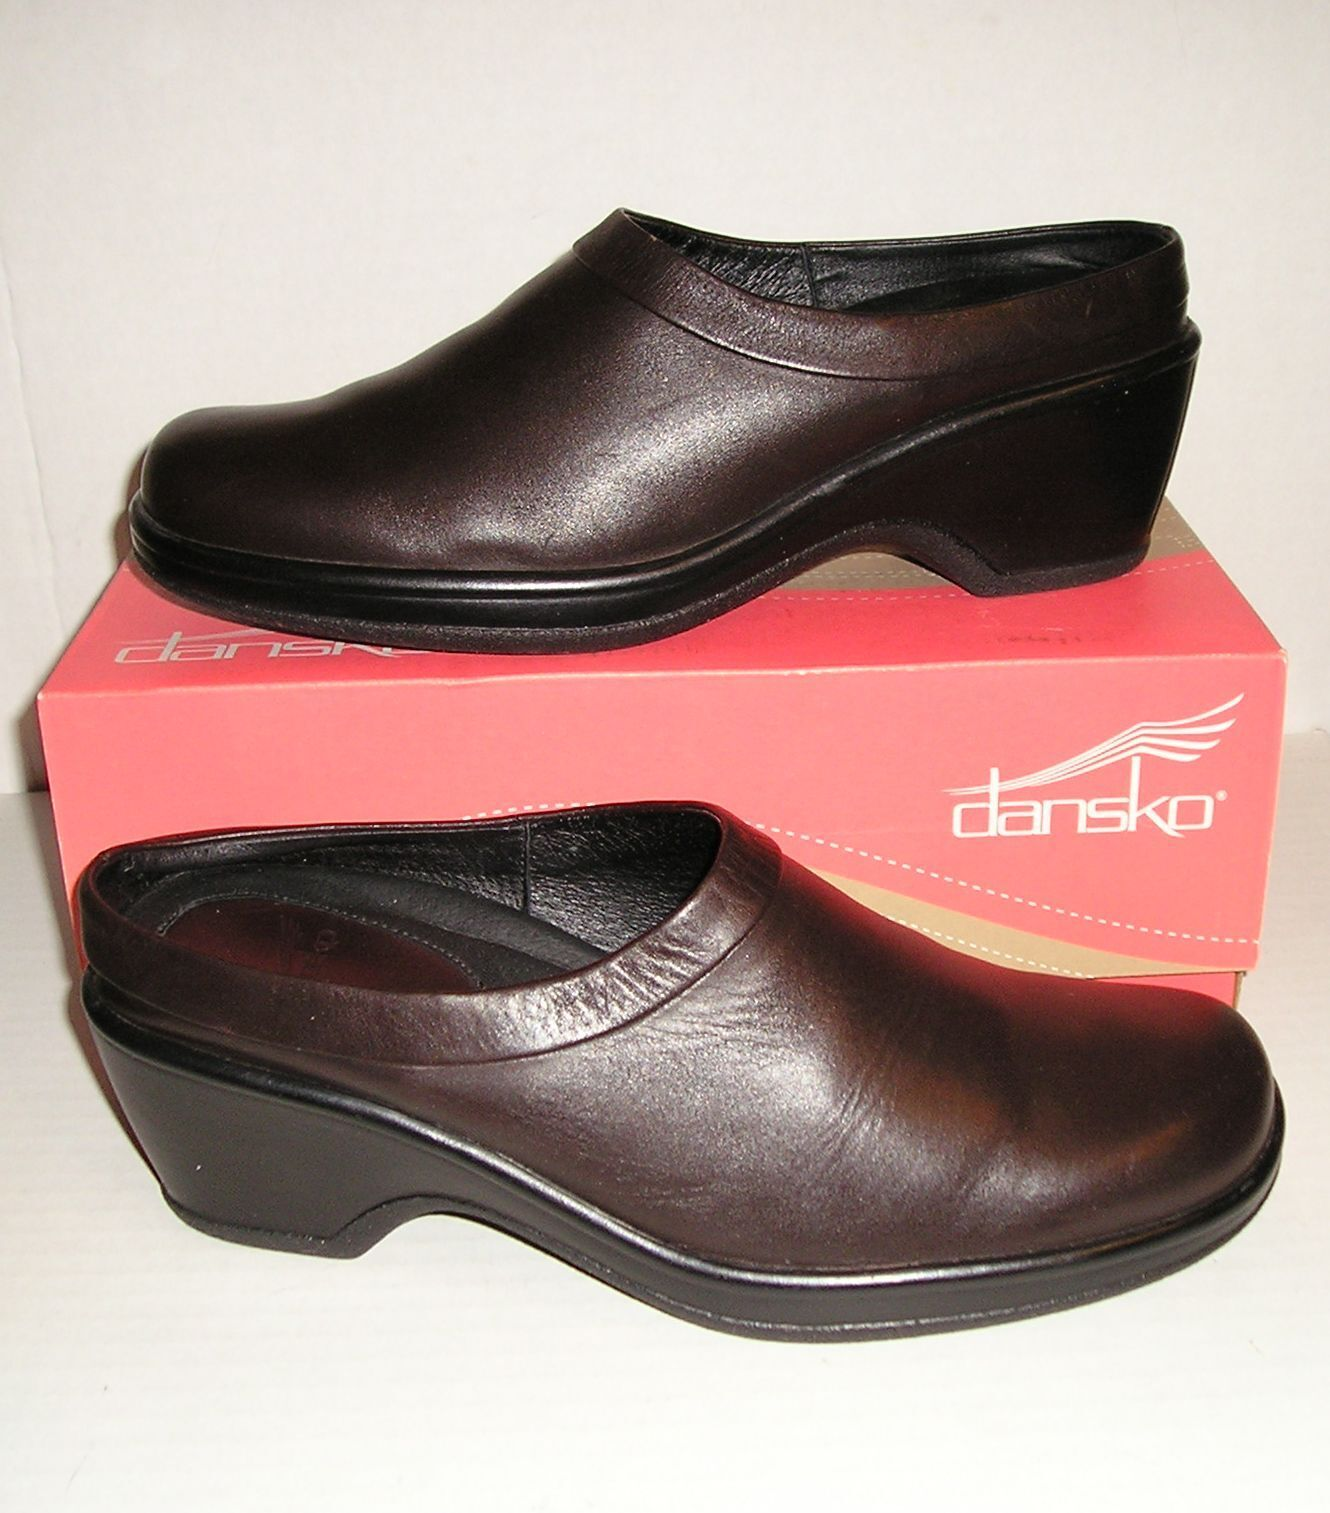 DANSKO Women's Dark Brown Leather Dress Mules Clogs Slip-Ons 40 EU   9.5 - 10 US